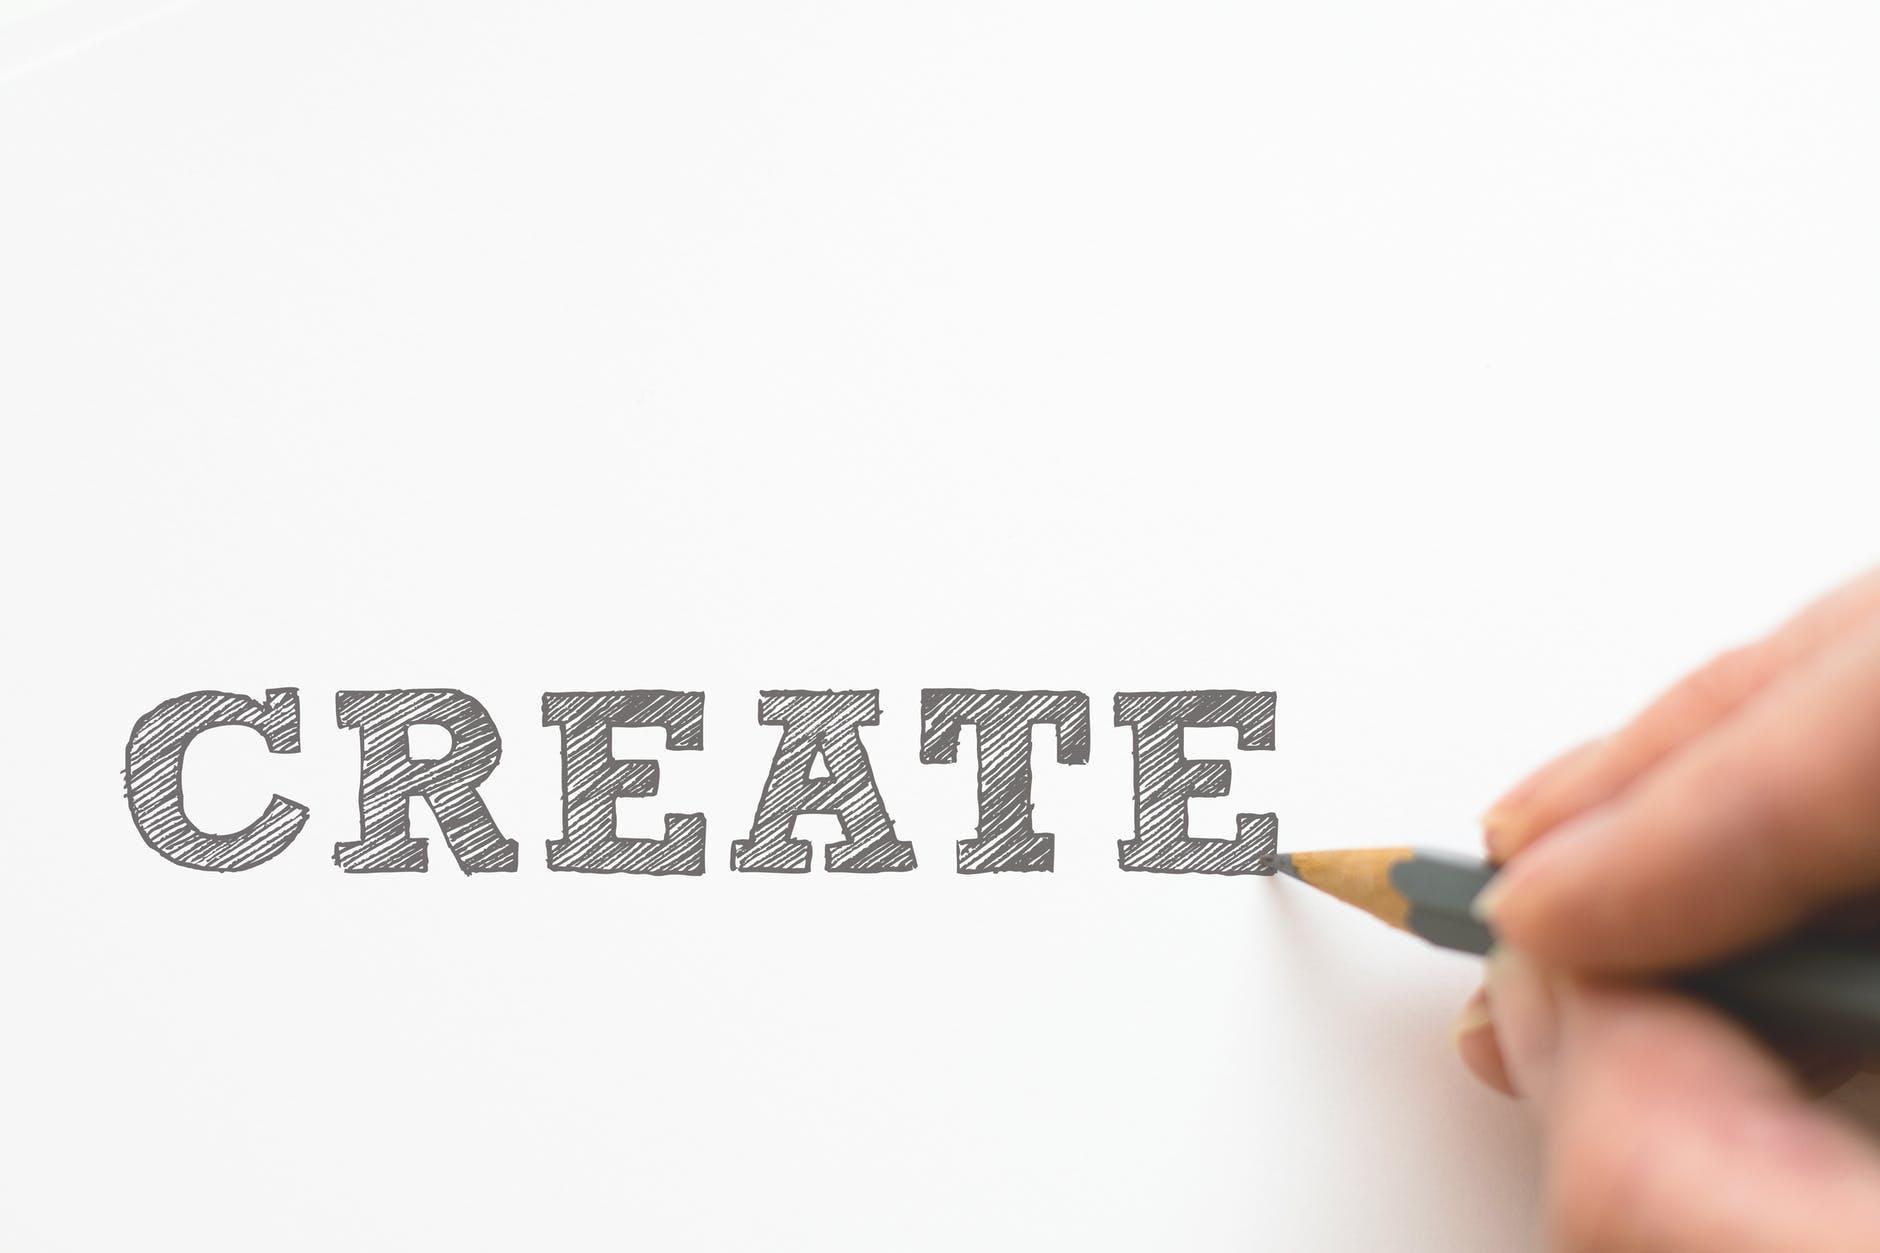 hand writing the word CREATE